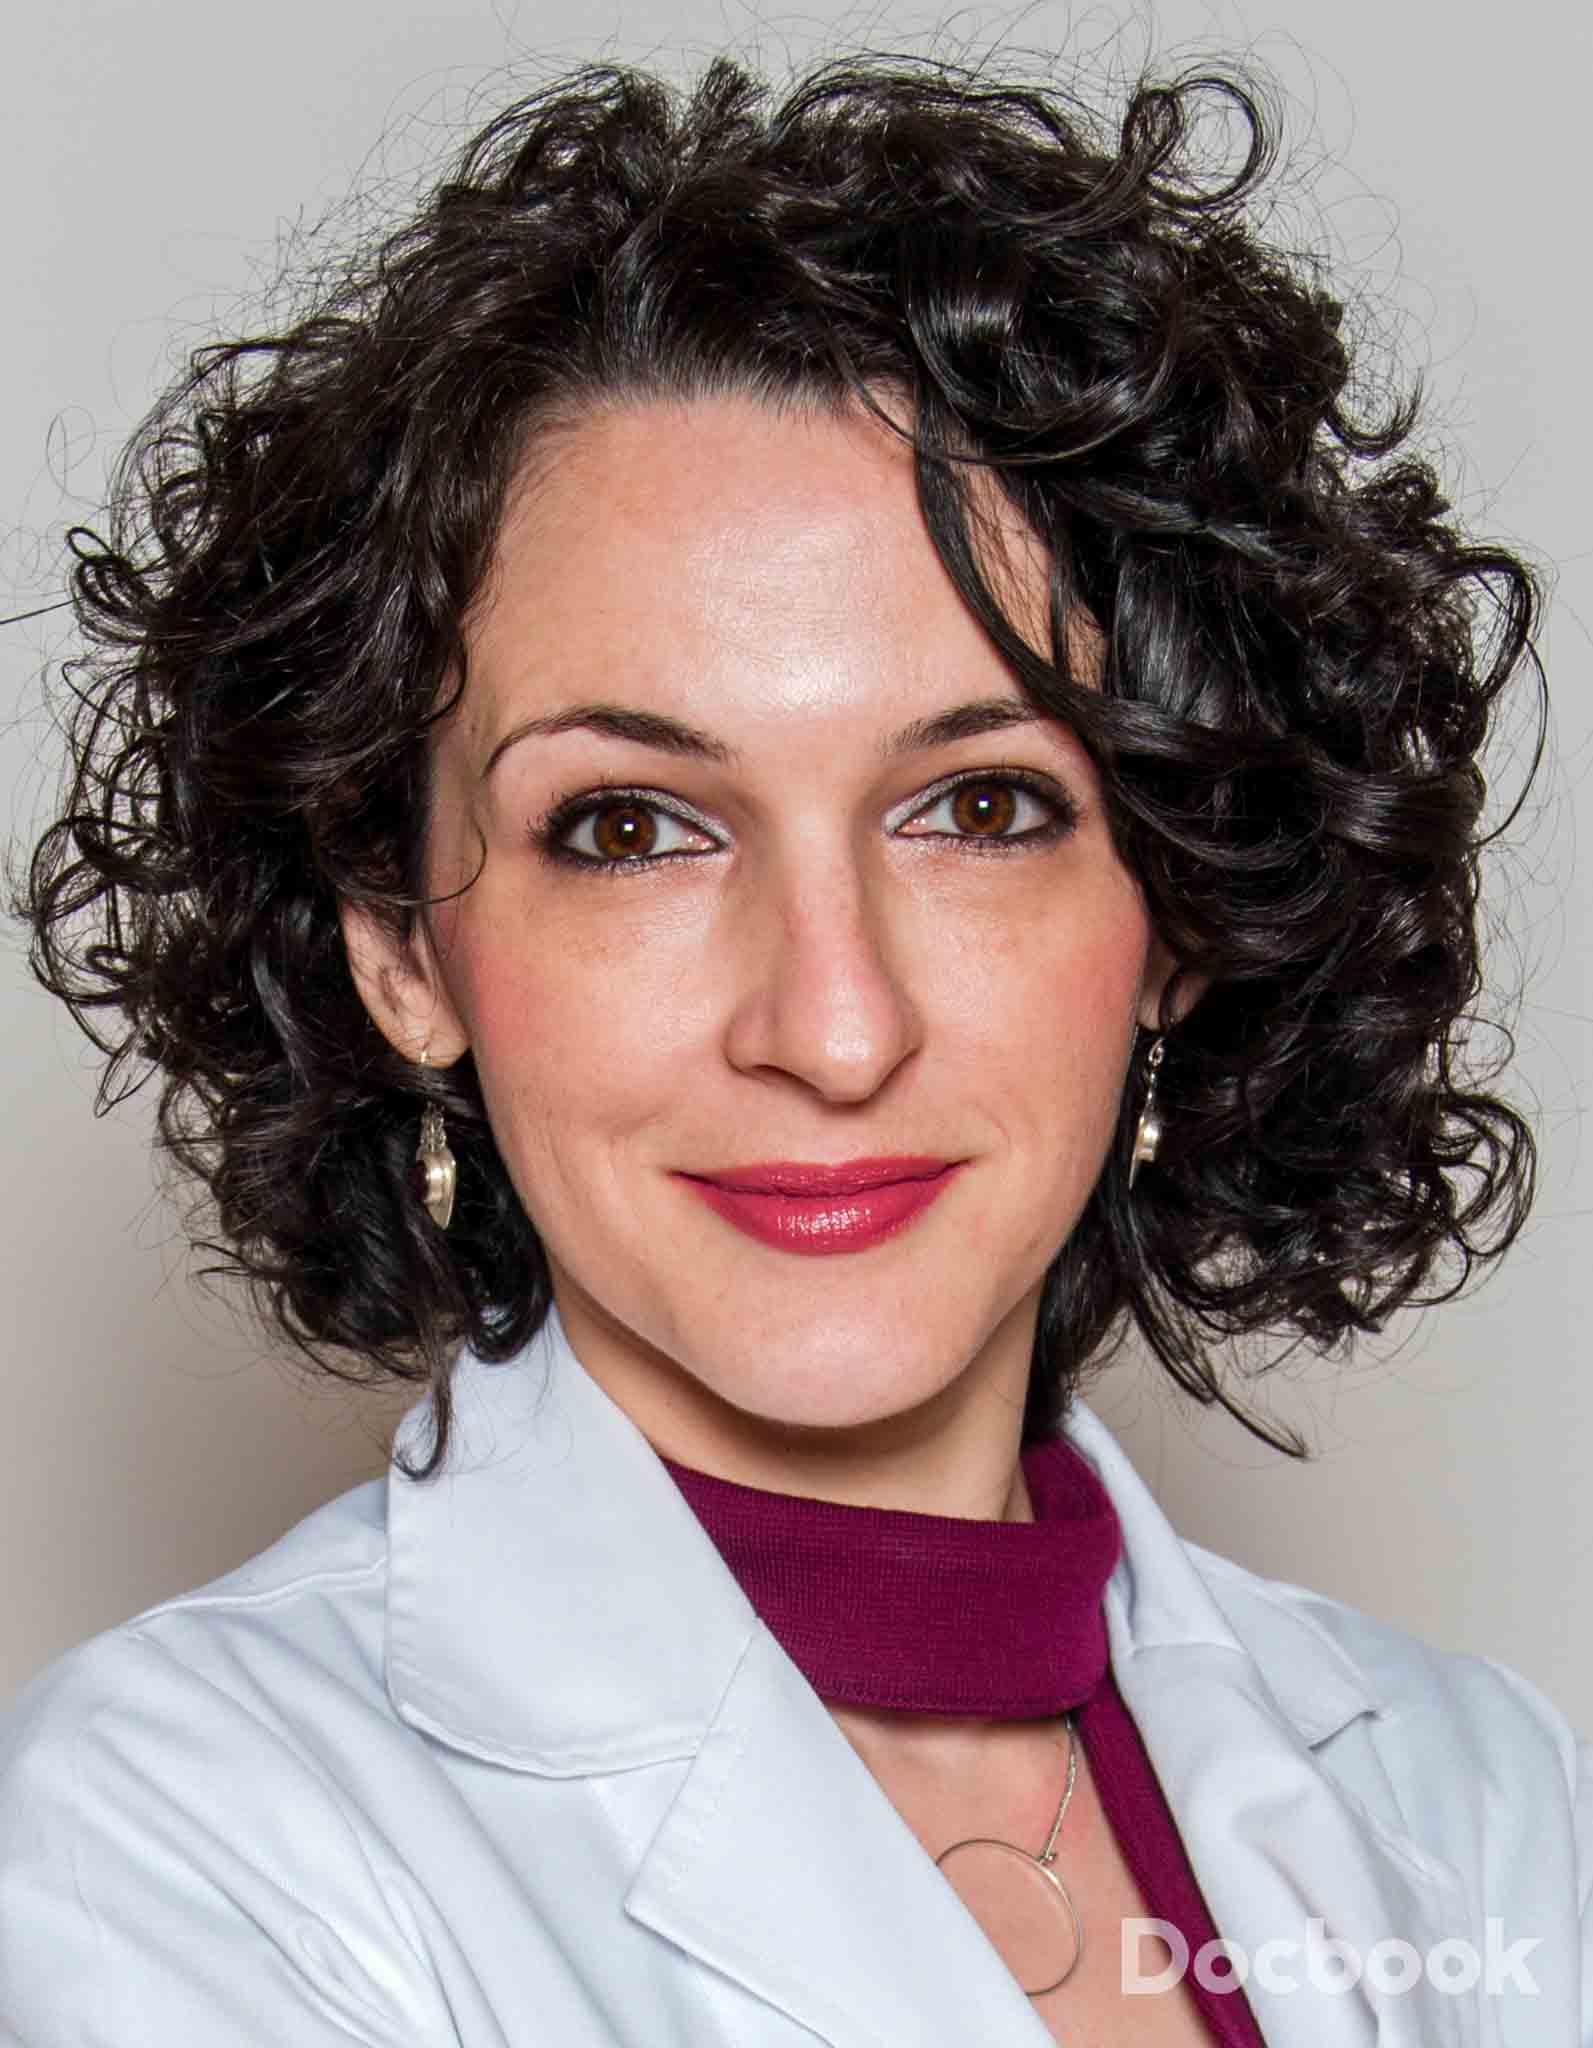 Dr. Andra-Liana Ianculescu